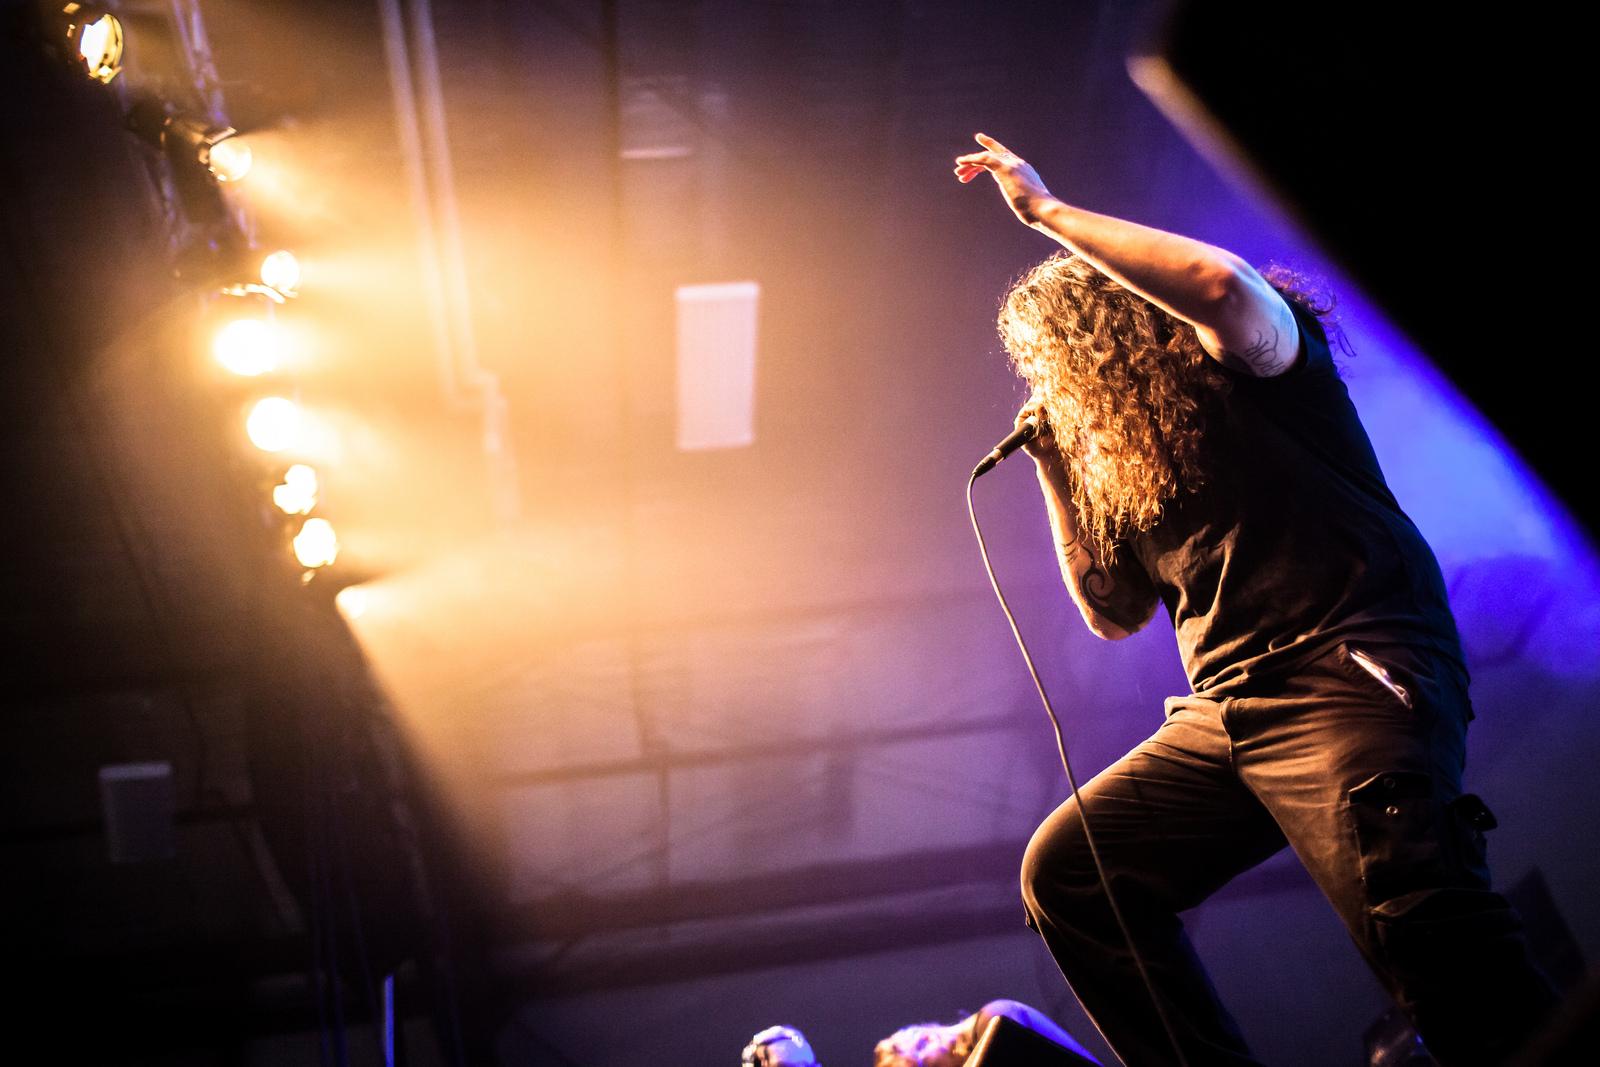 death metal heavy hard rock concert concerts wallpaper background 1600x1067